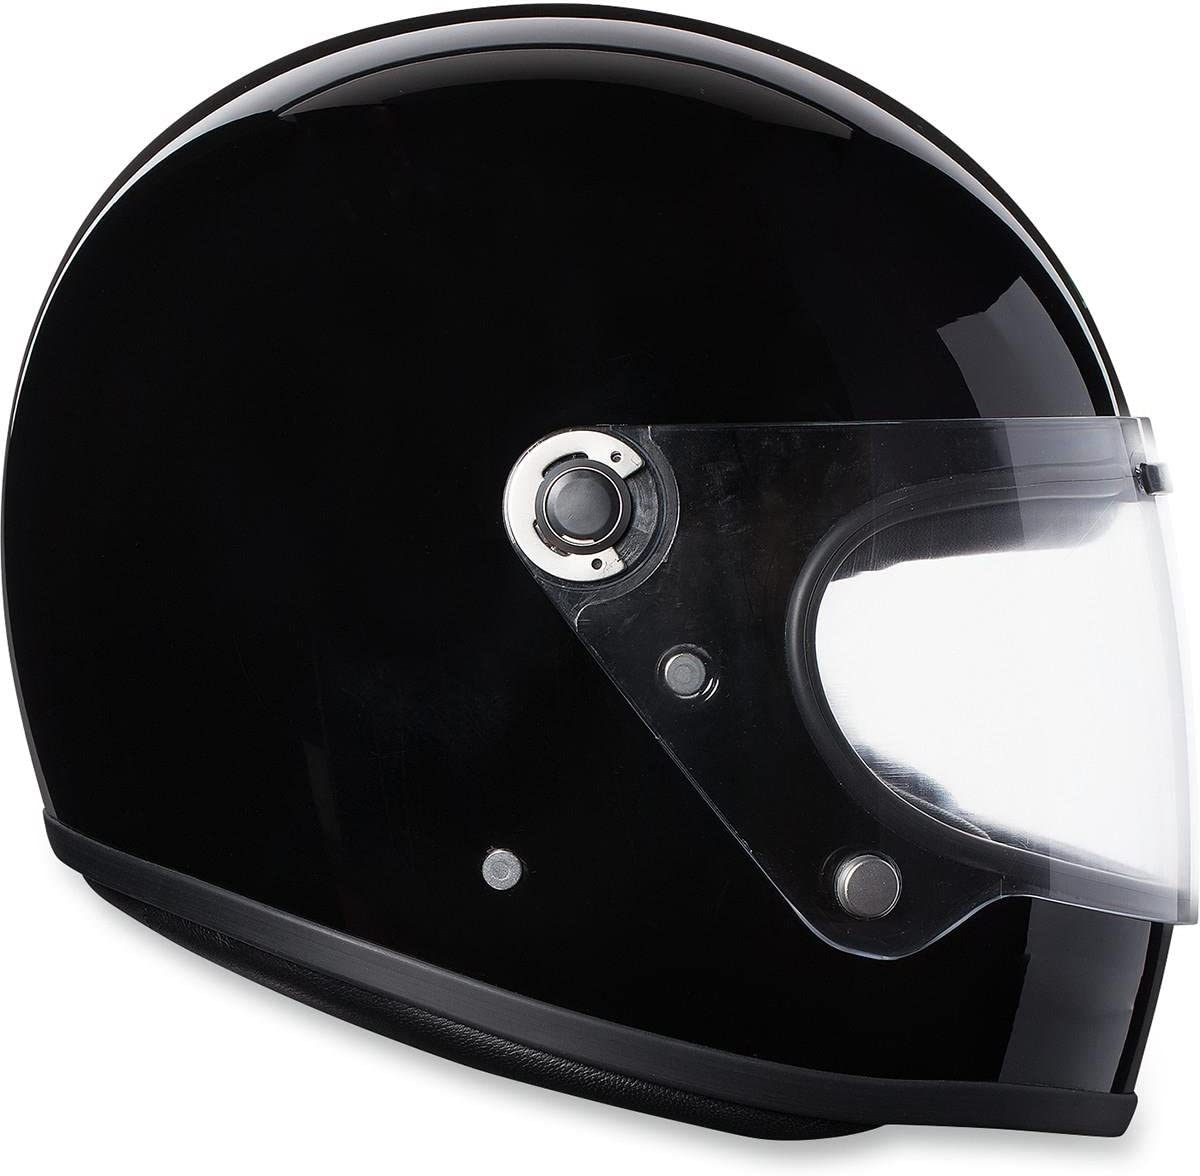 AGV 20001154I000210 Legends X3000 Black Helmet (Black, X-Large)